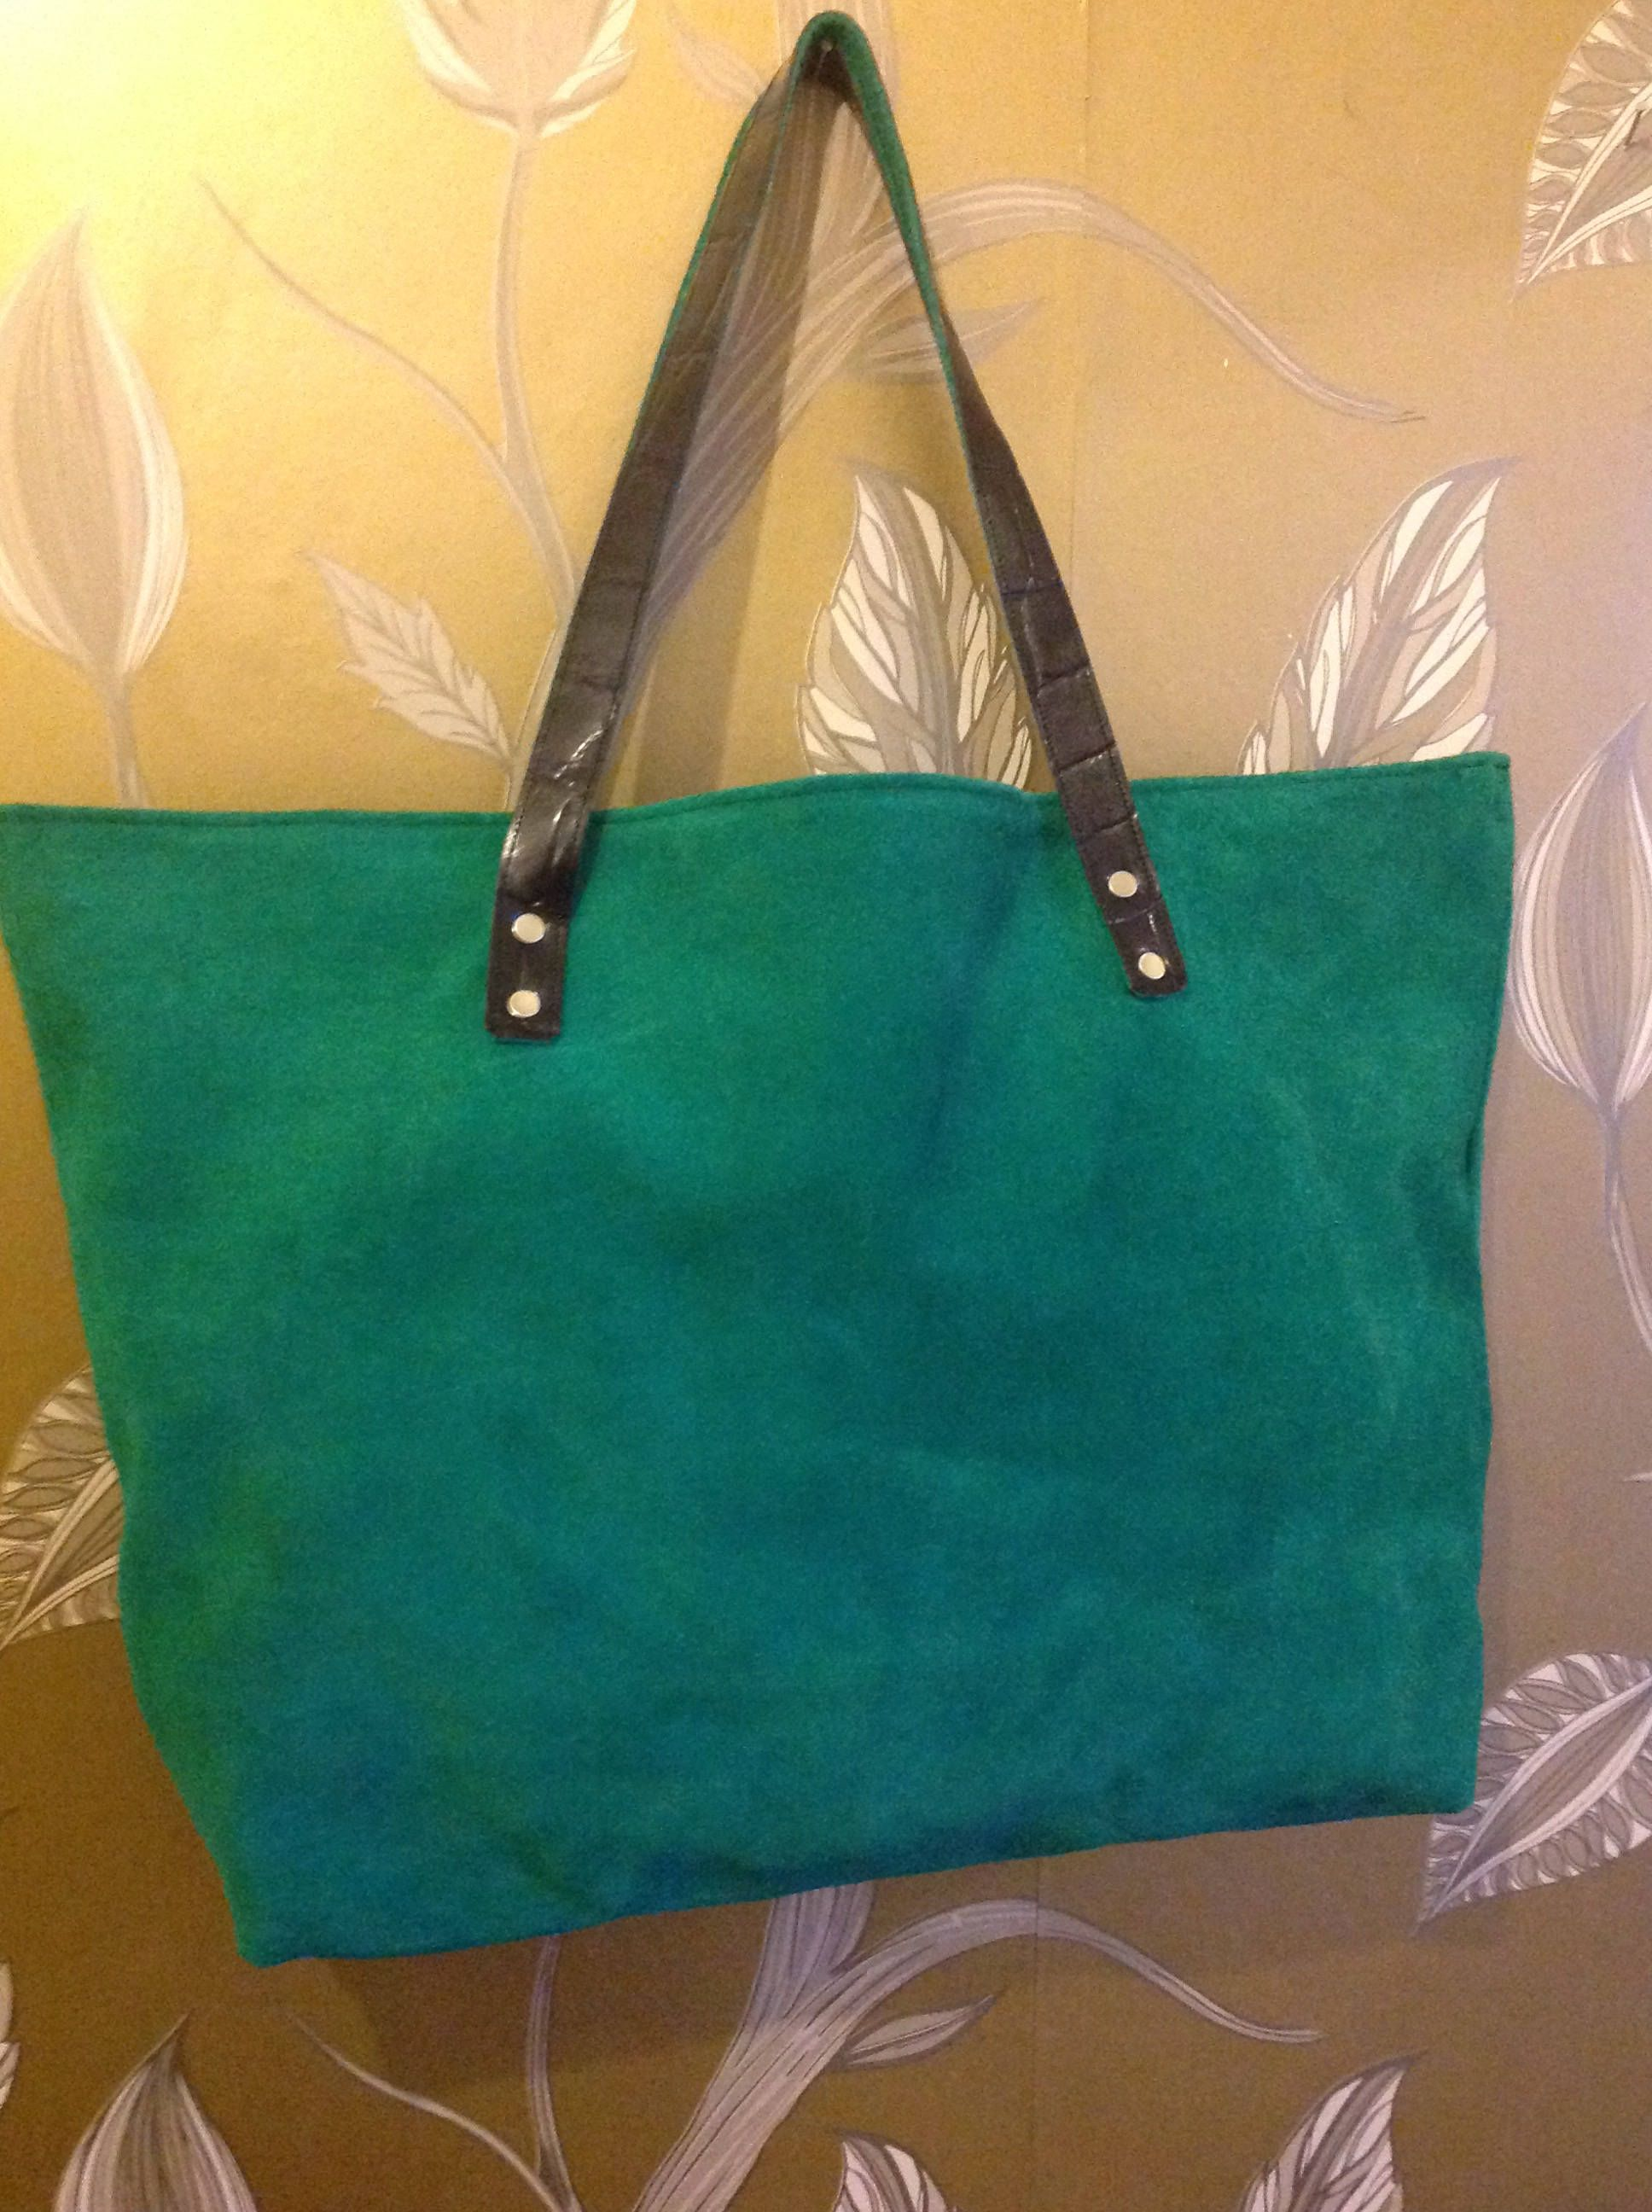 a468b3aaaf8d82 Black Friday Sale! Green Suede Zara Tote bag - Handmade in UK 25% off